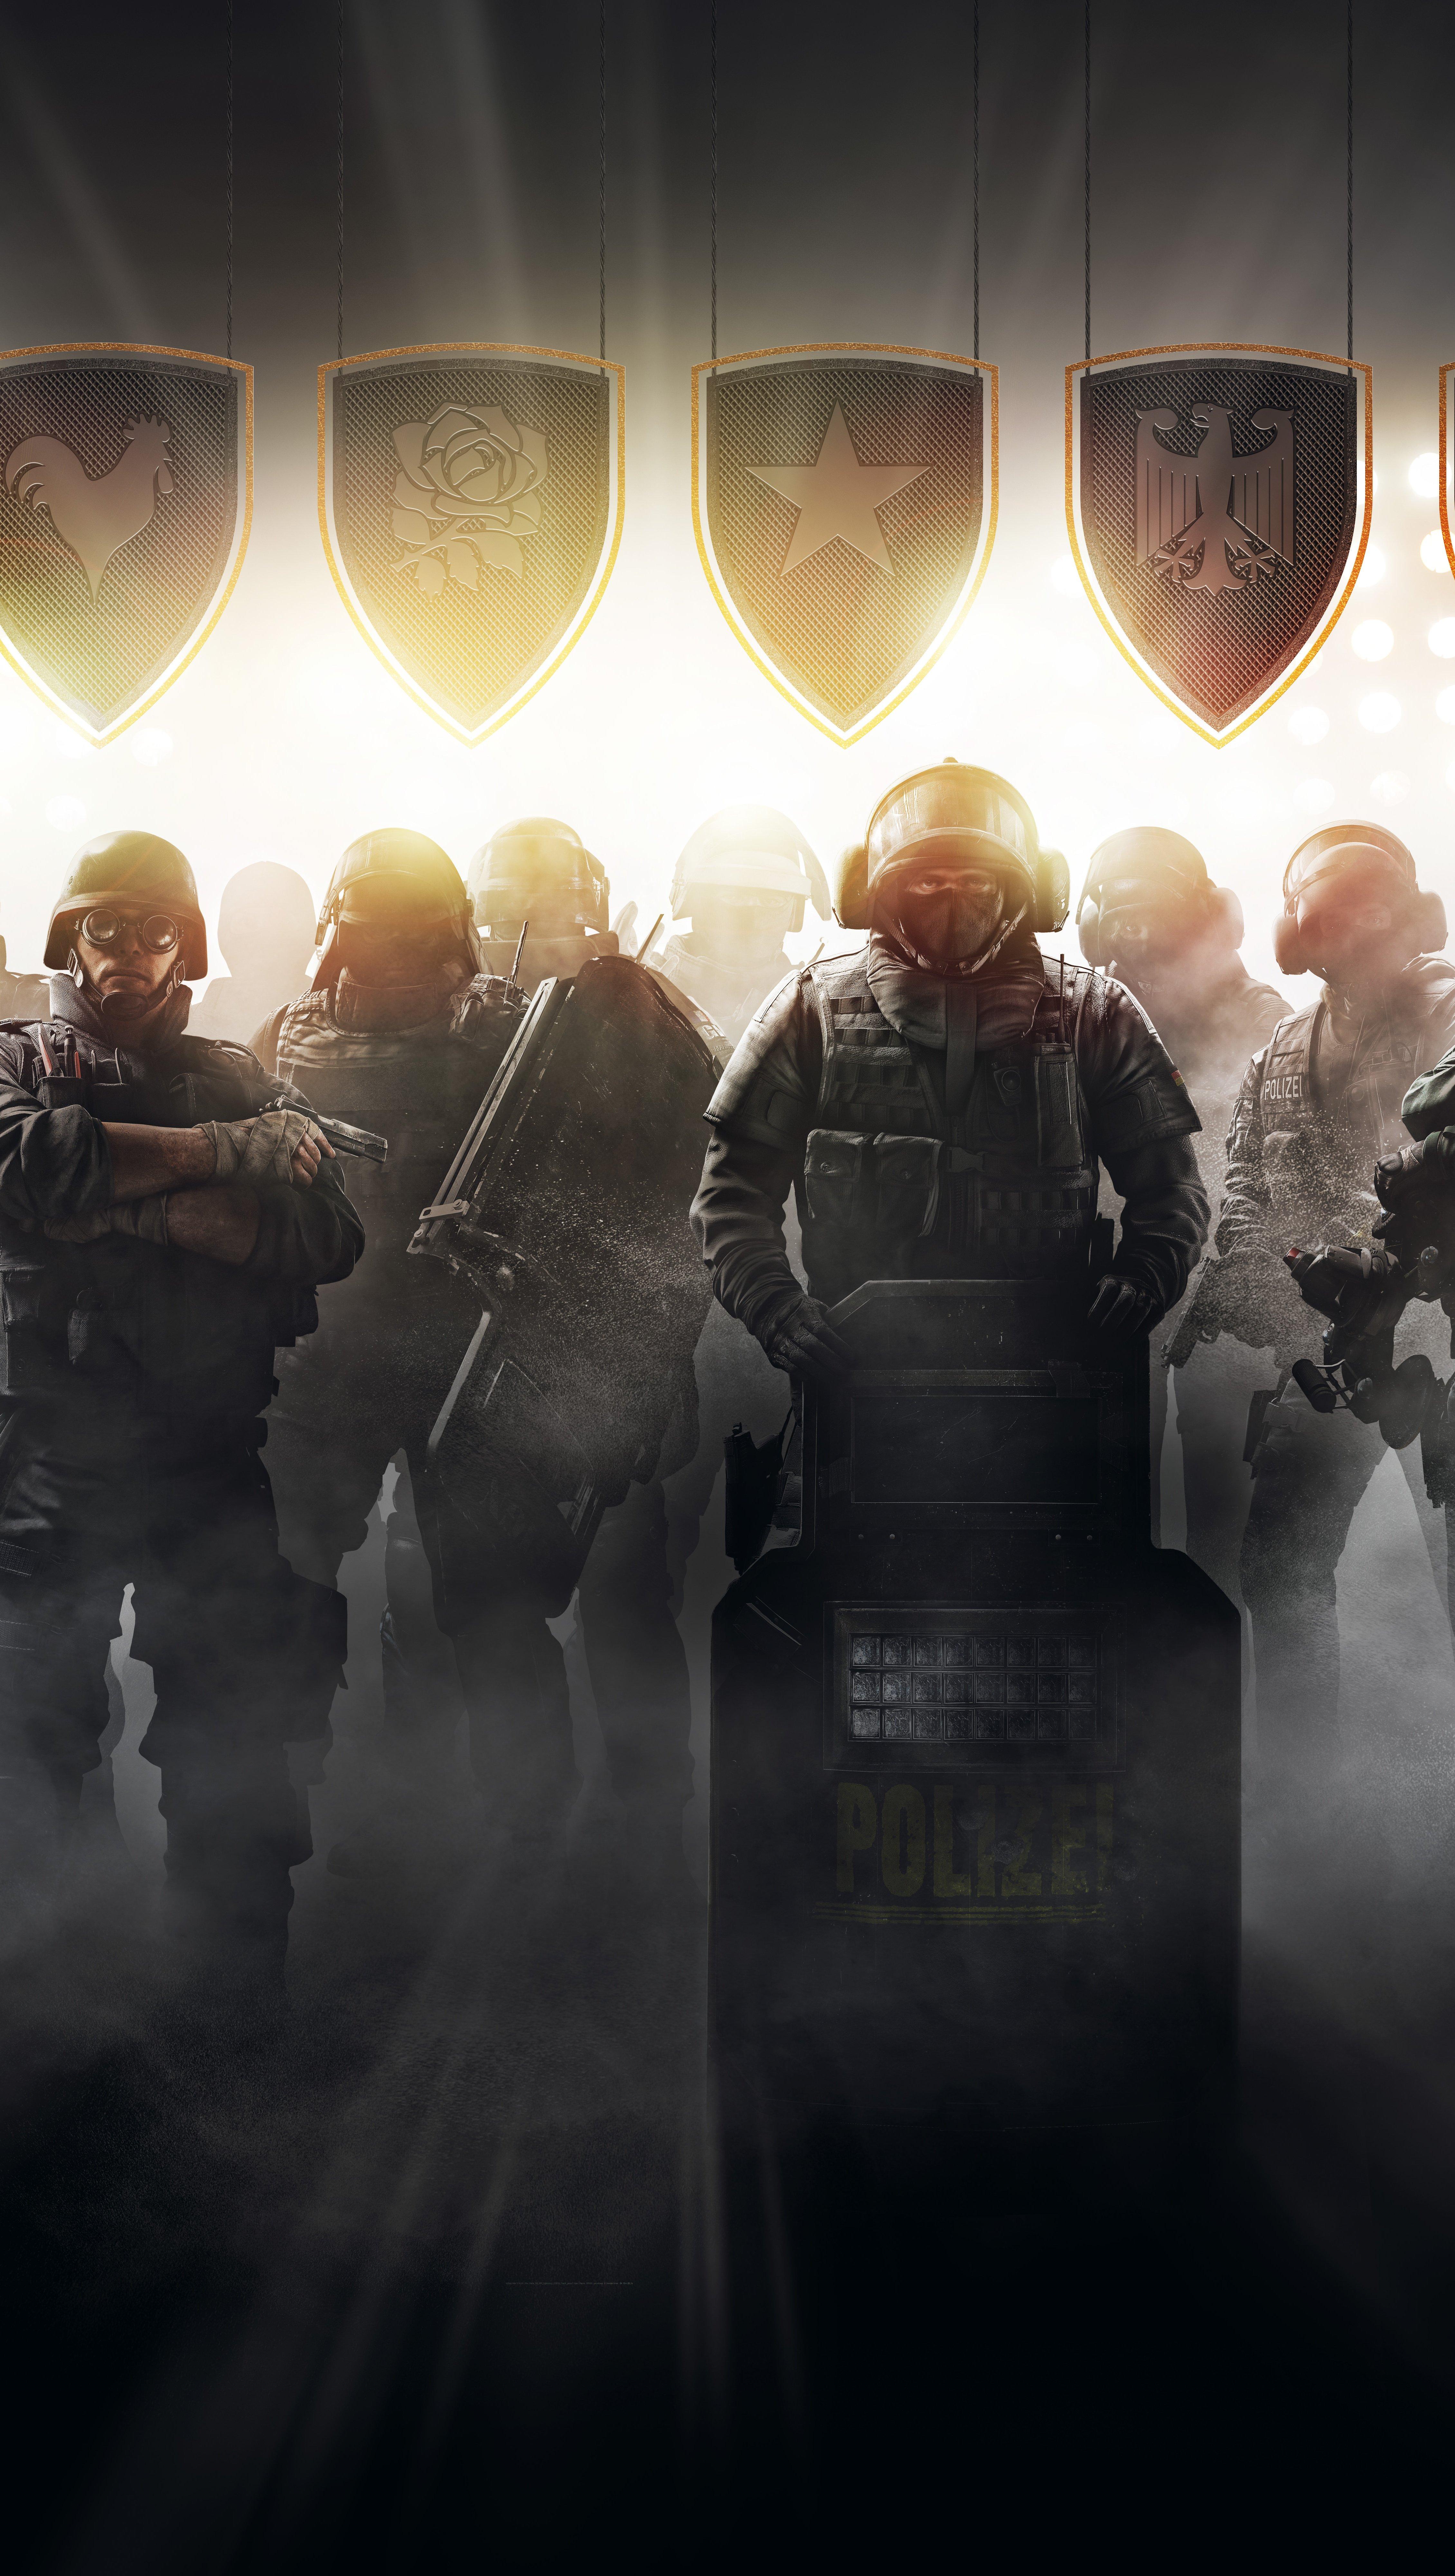 Fondos de pantalla Tom Clancy's Rainbow Six Siege Pro League Vertical